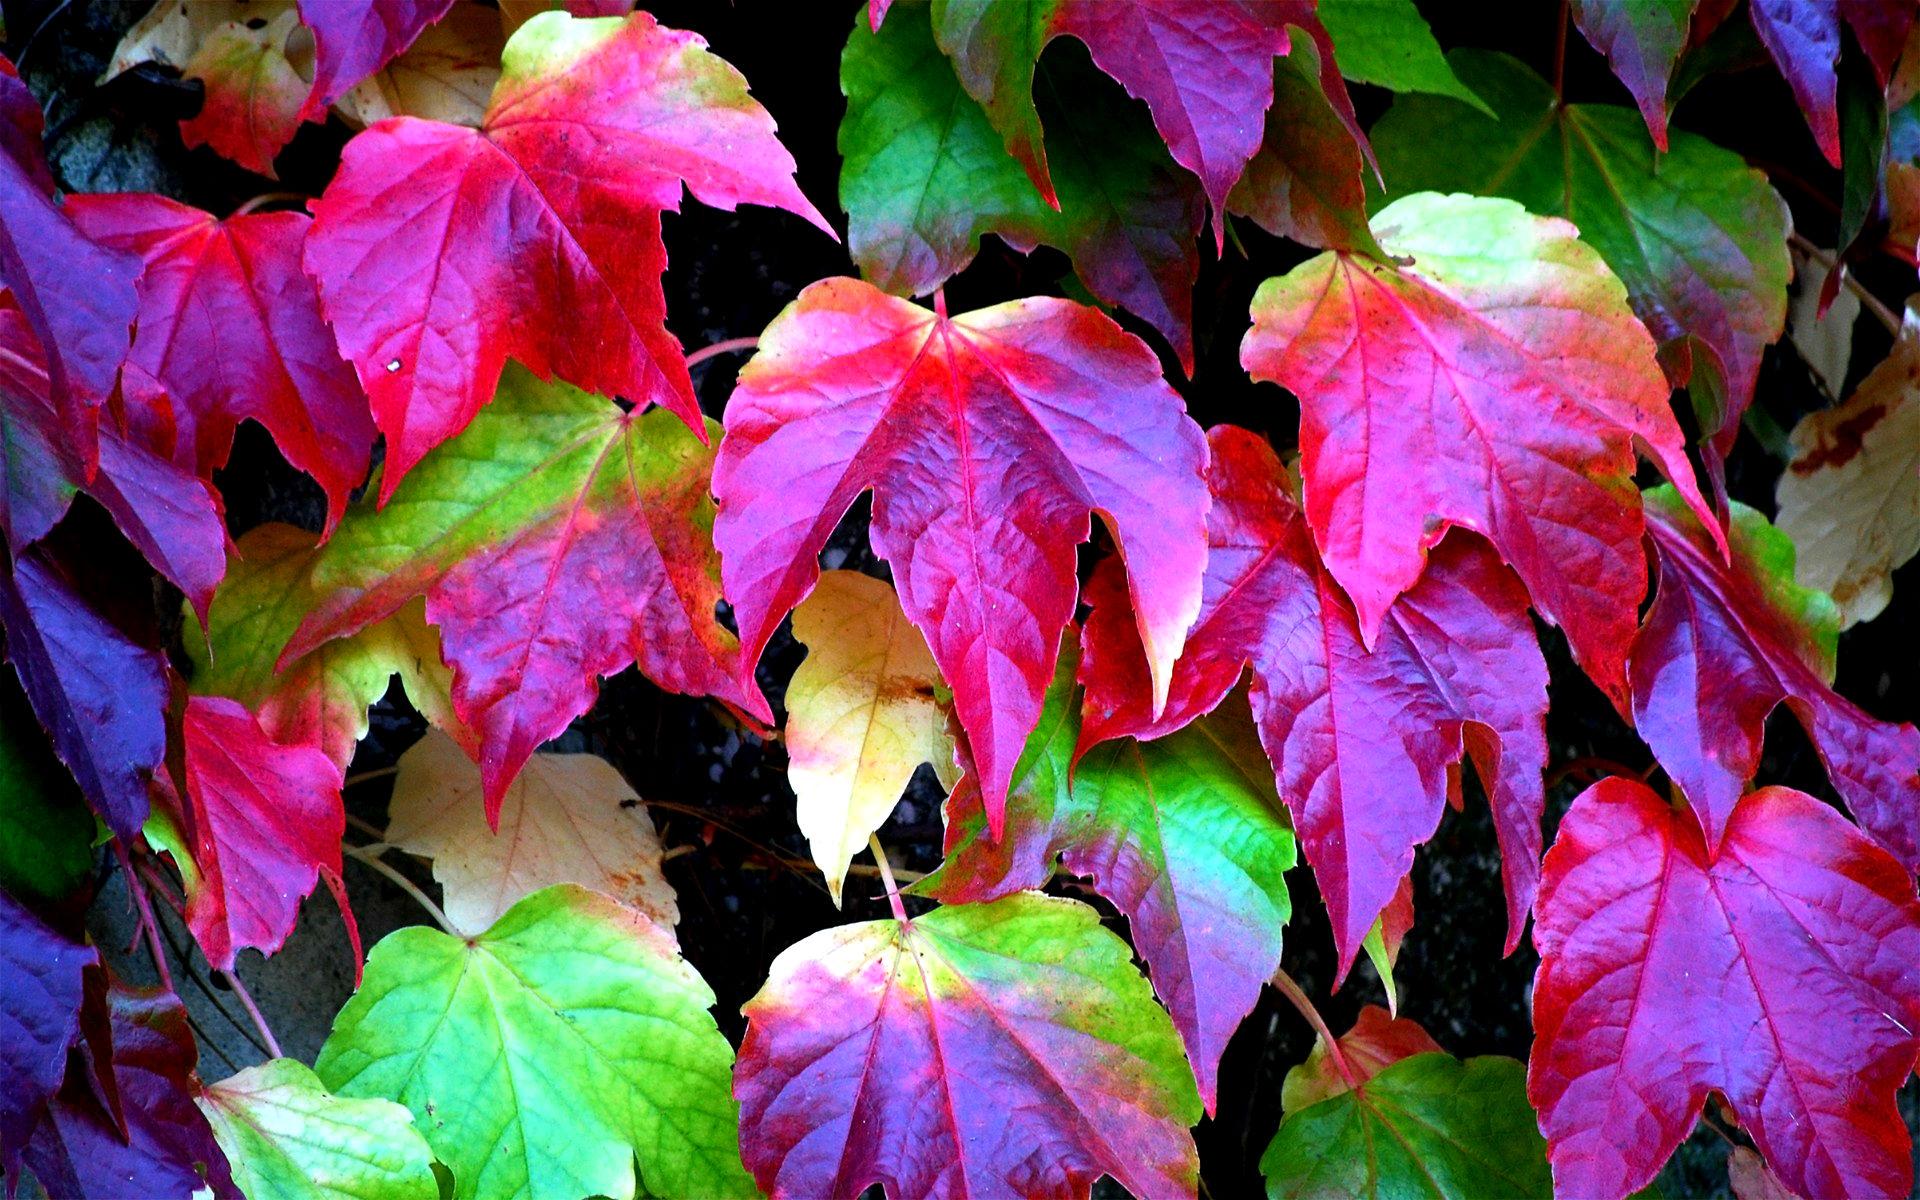 Autumn Falling Leaves Live Wallpaper Leaves Colors Hd Desktop Wallpapers 4k Hd